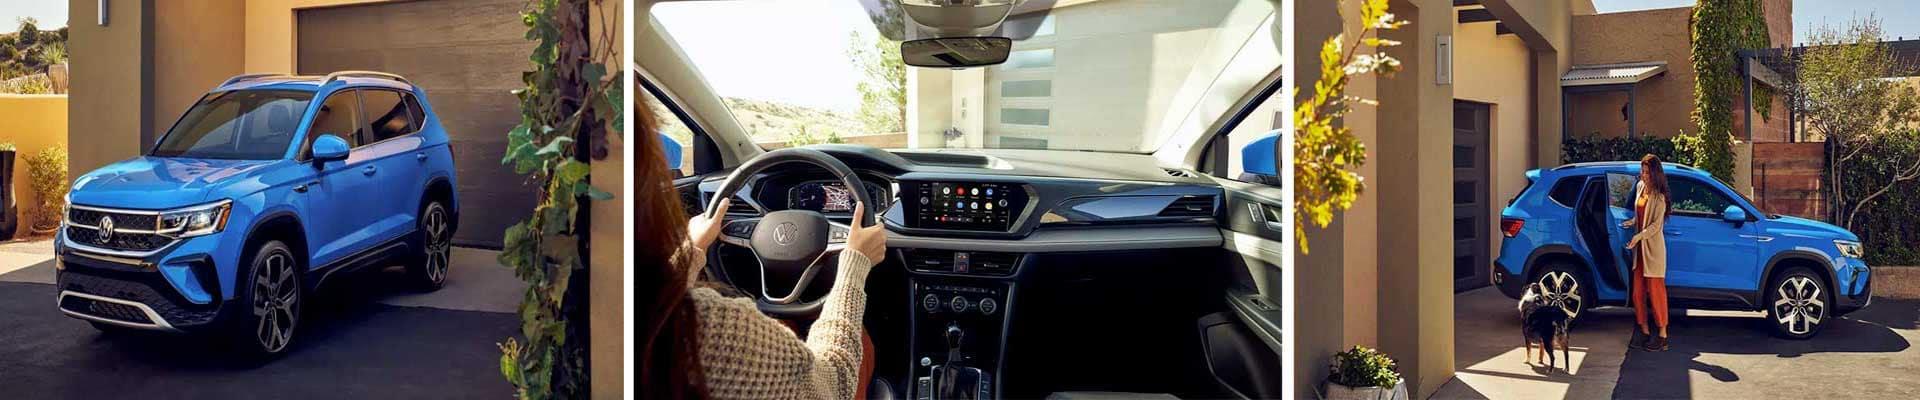 2020 Volkswagen taos For Sale West Palm Beach FL   Wellington